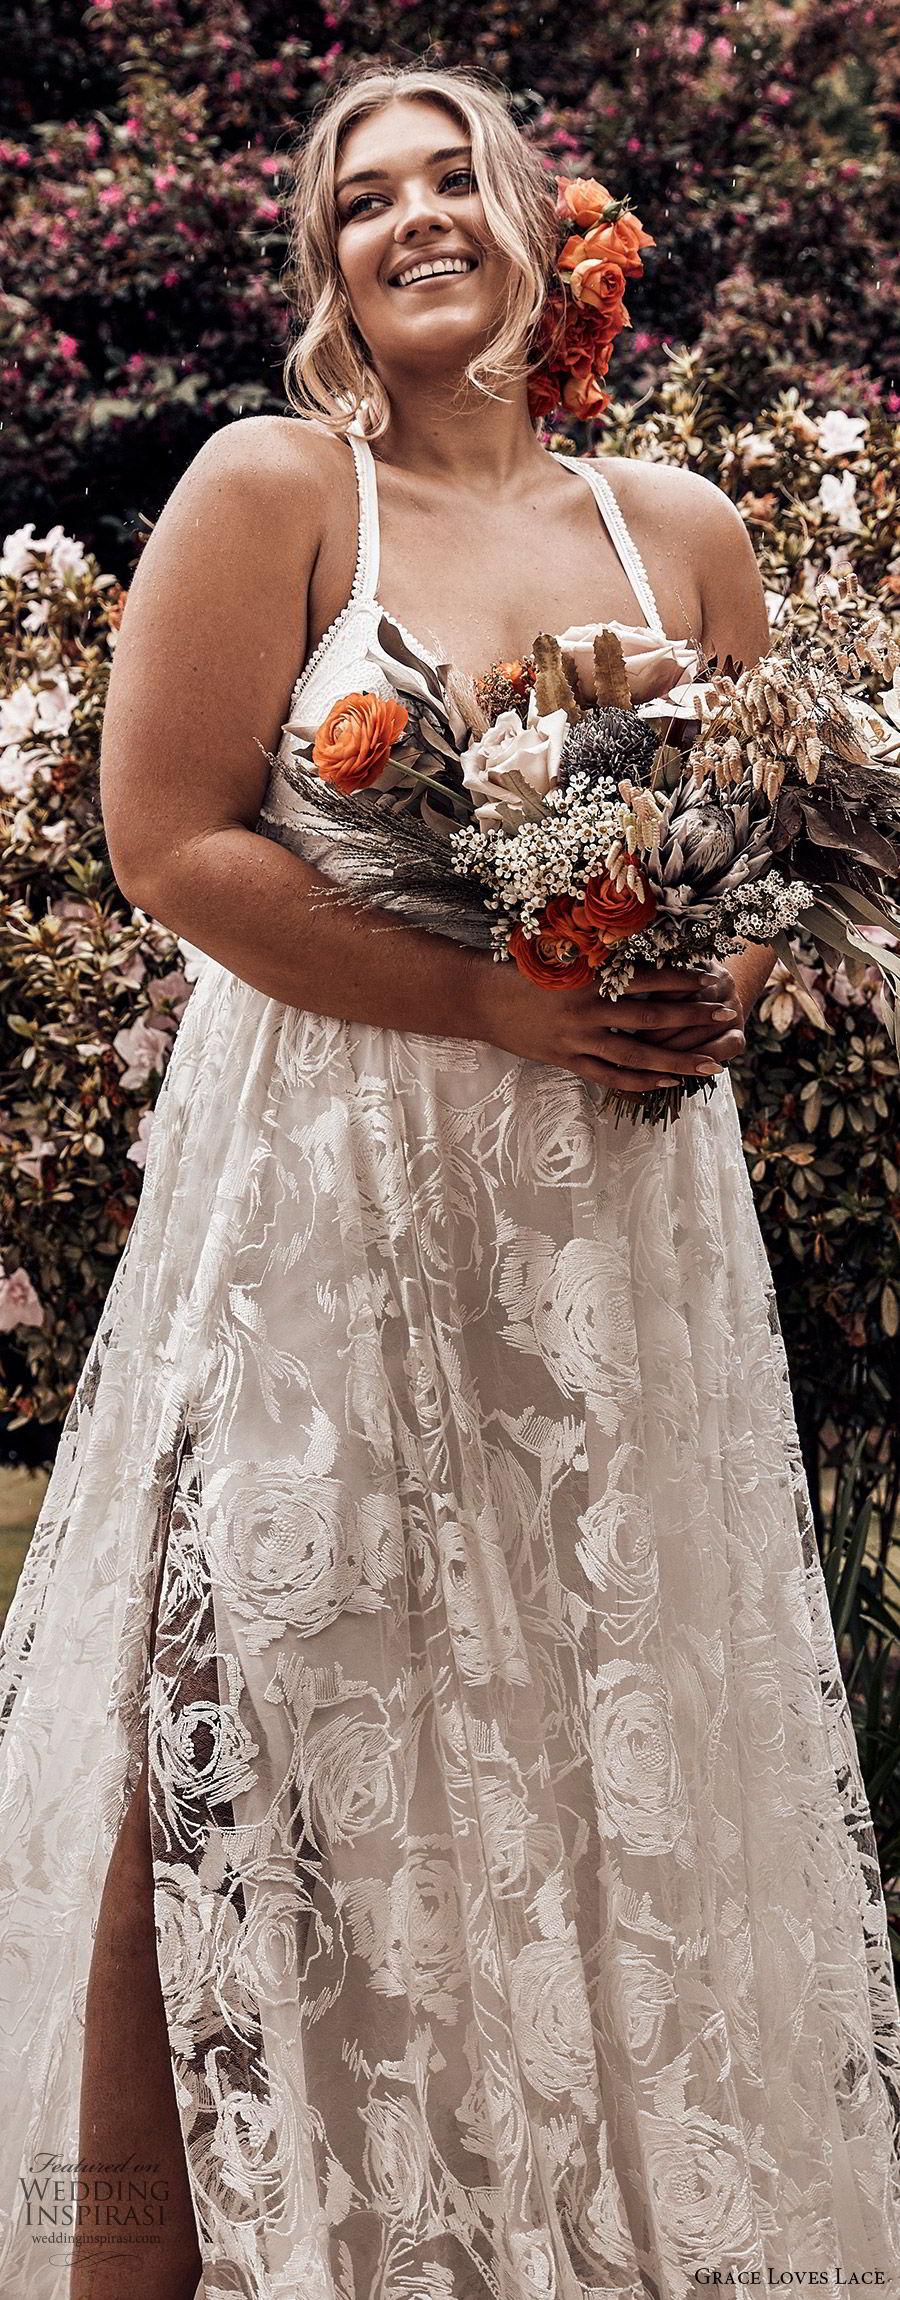 grace loves lace 2019 bridal sleeveless straps sweetheart neckline fully embellished lace a line ball gown wedding dress plus size slit skirt chapel train elegant romantic (2) lv